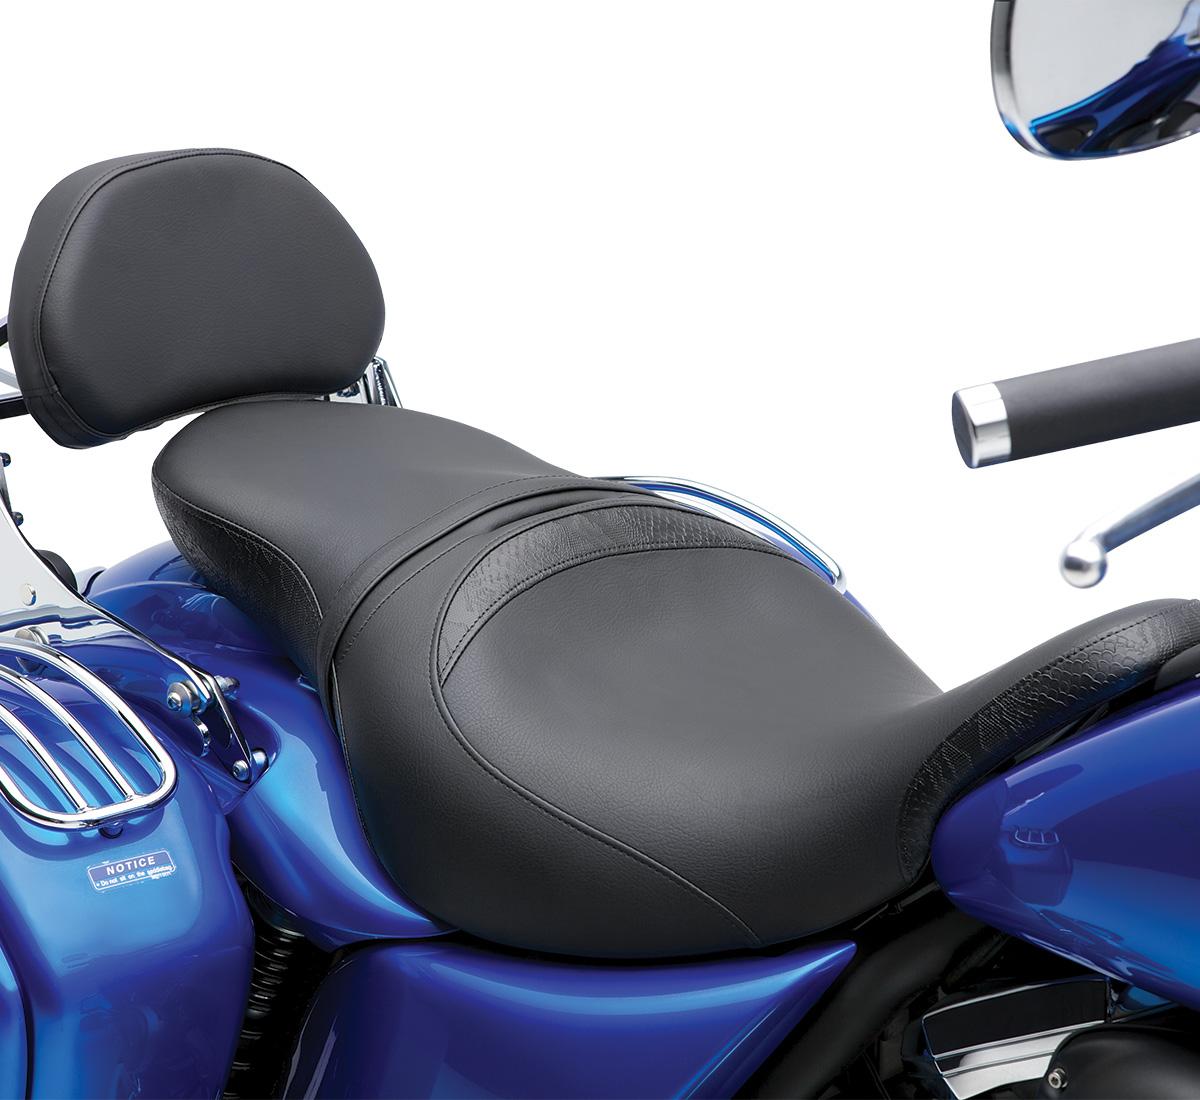 2014 vulcan® 1700 vaquero® abs gel seat, touring